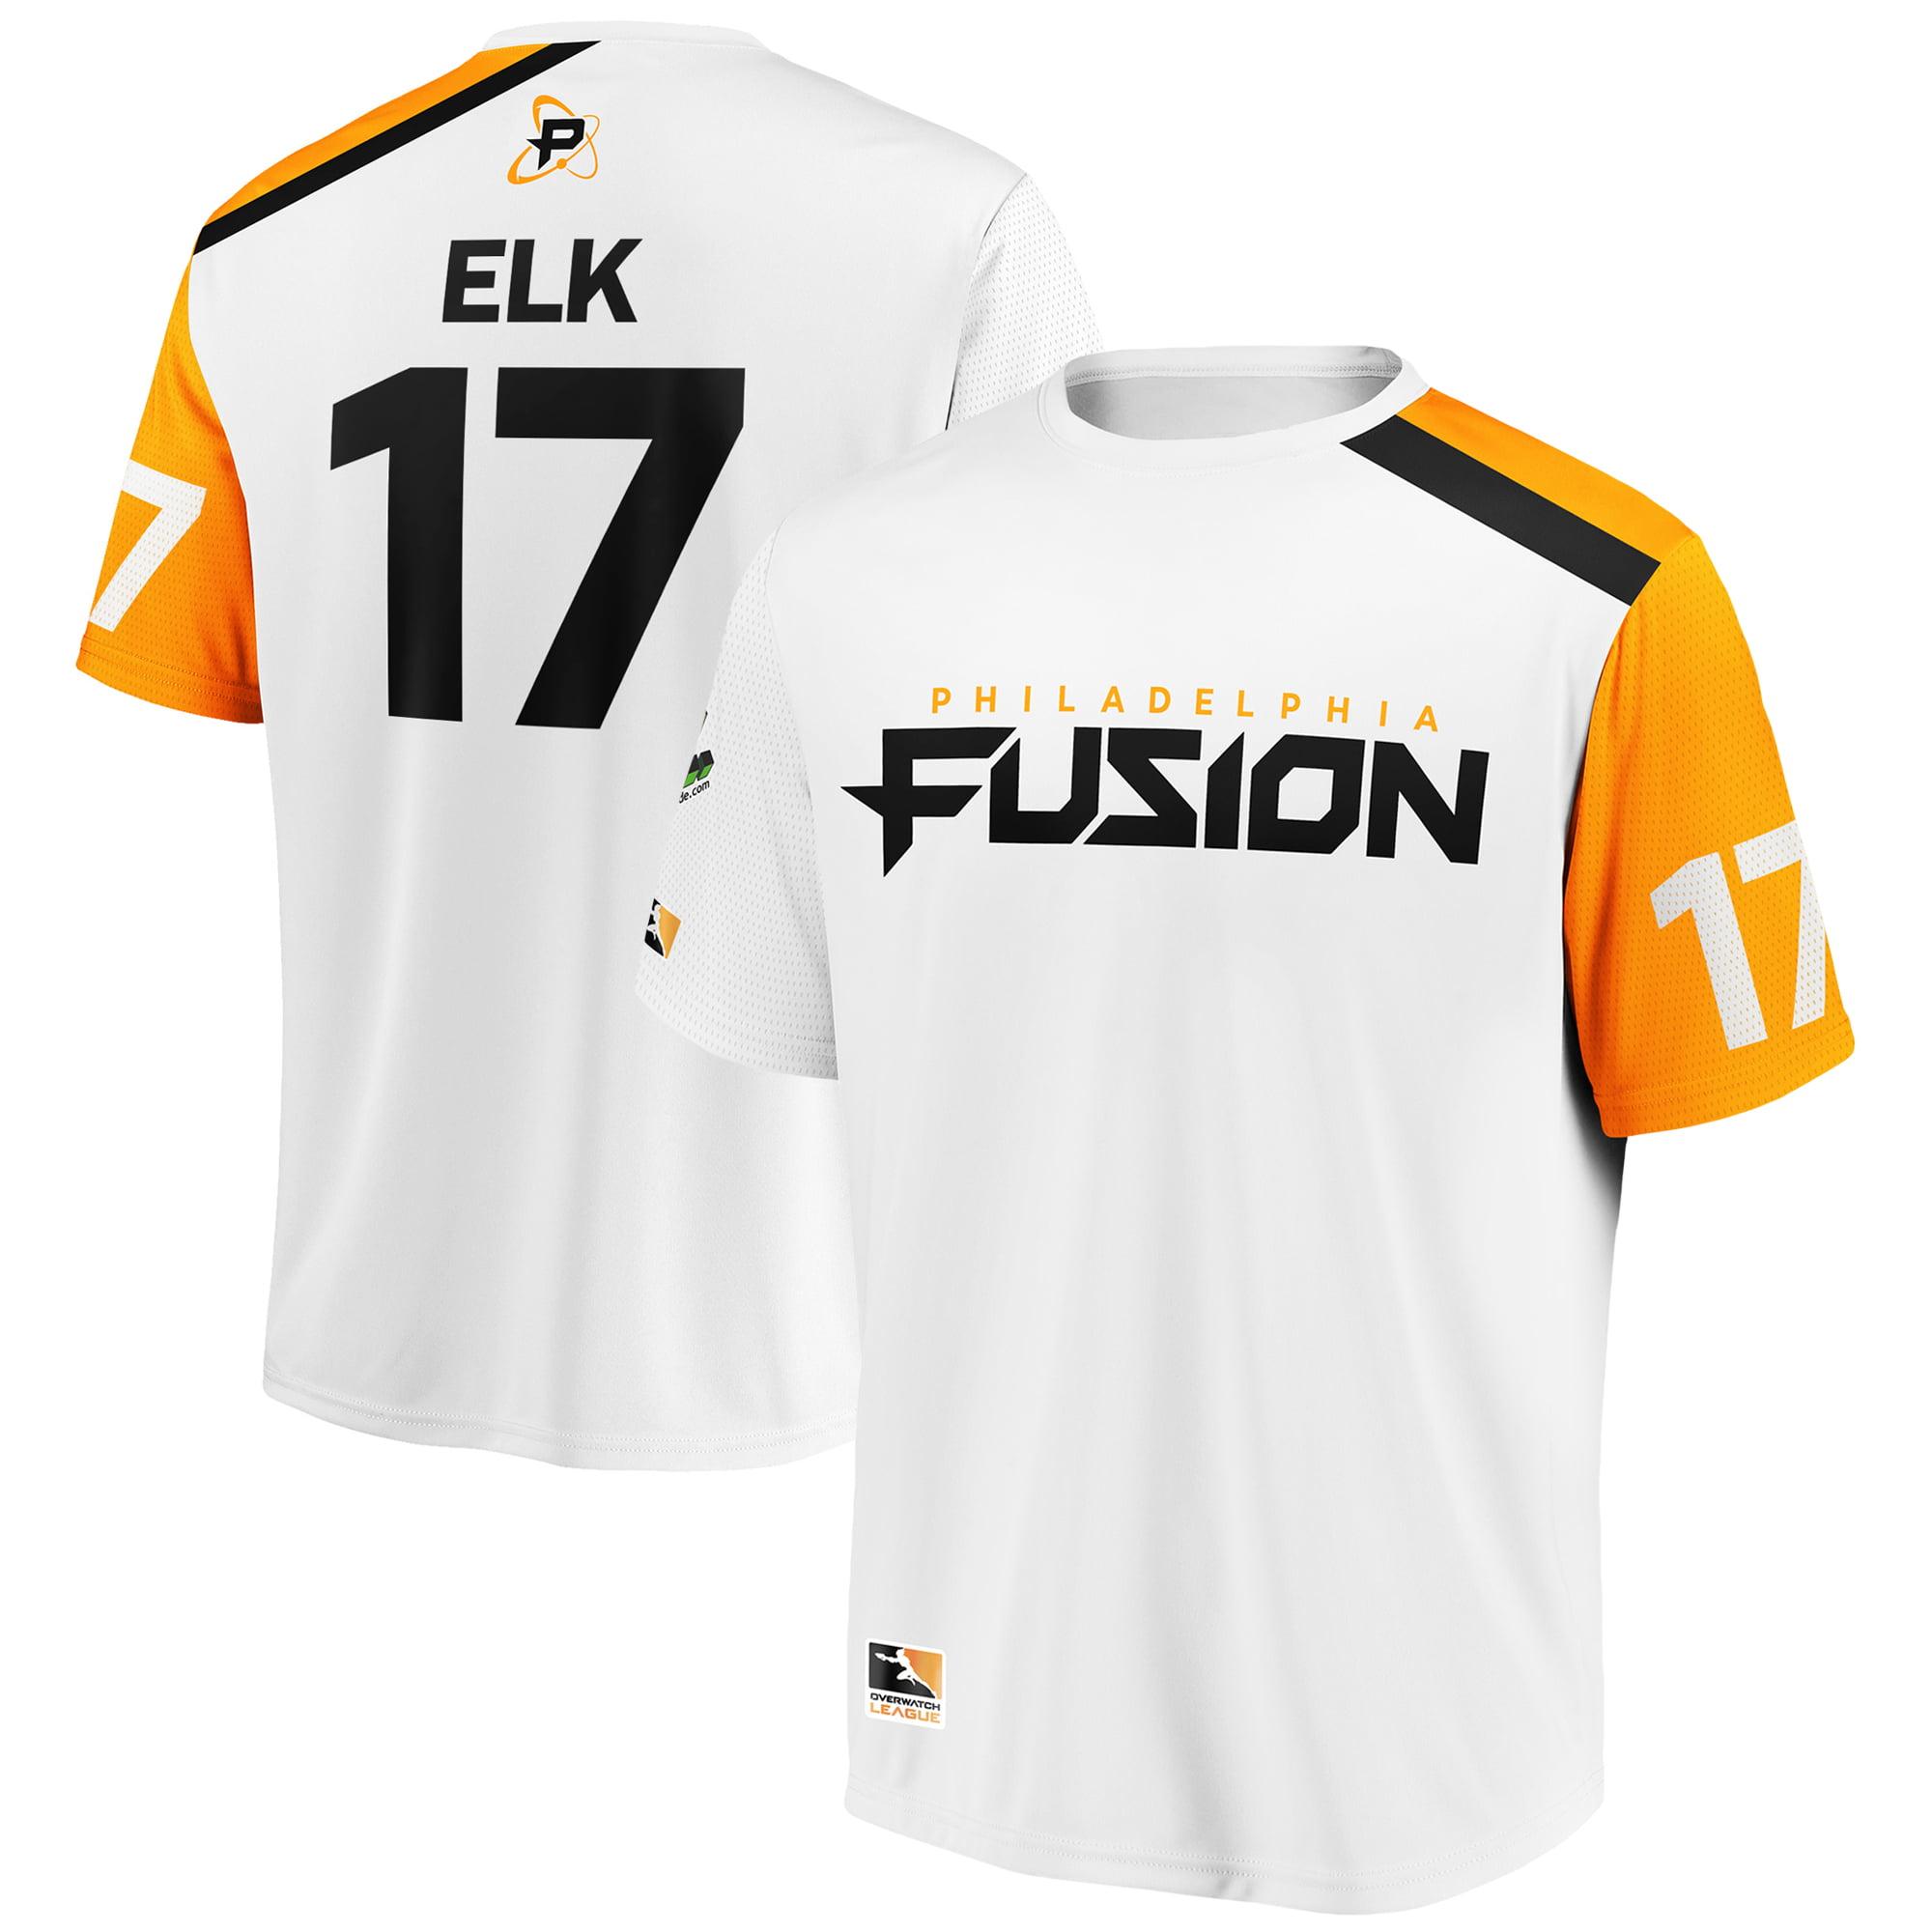 Elk Philadelphia Fusion Overwatch League Replica Away Jersey - White